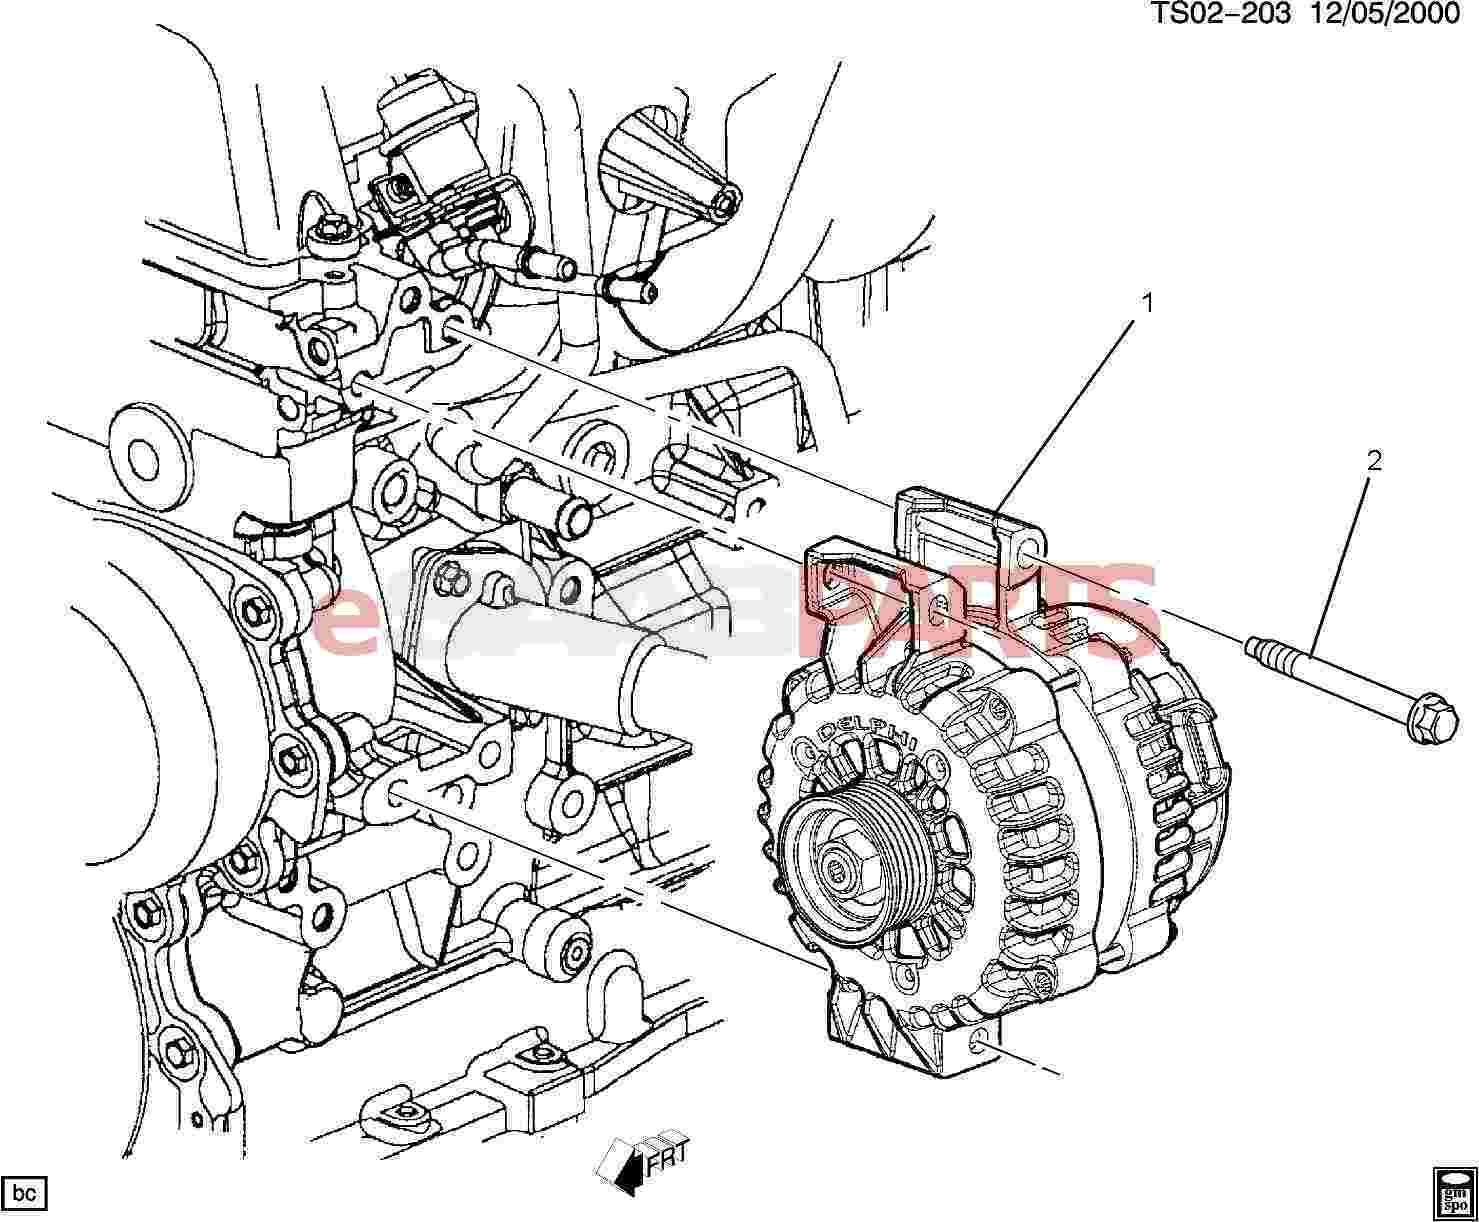 32835 esaabparts com saab 9 7x \u003e electrical parts \u003e alternator & related